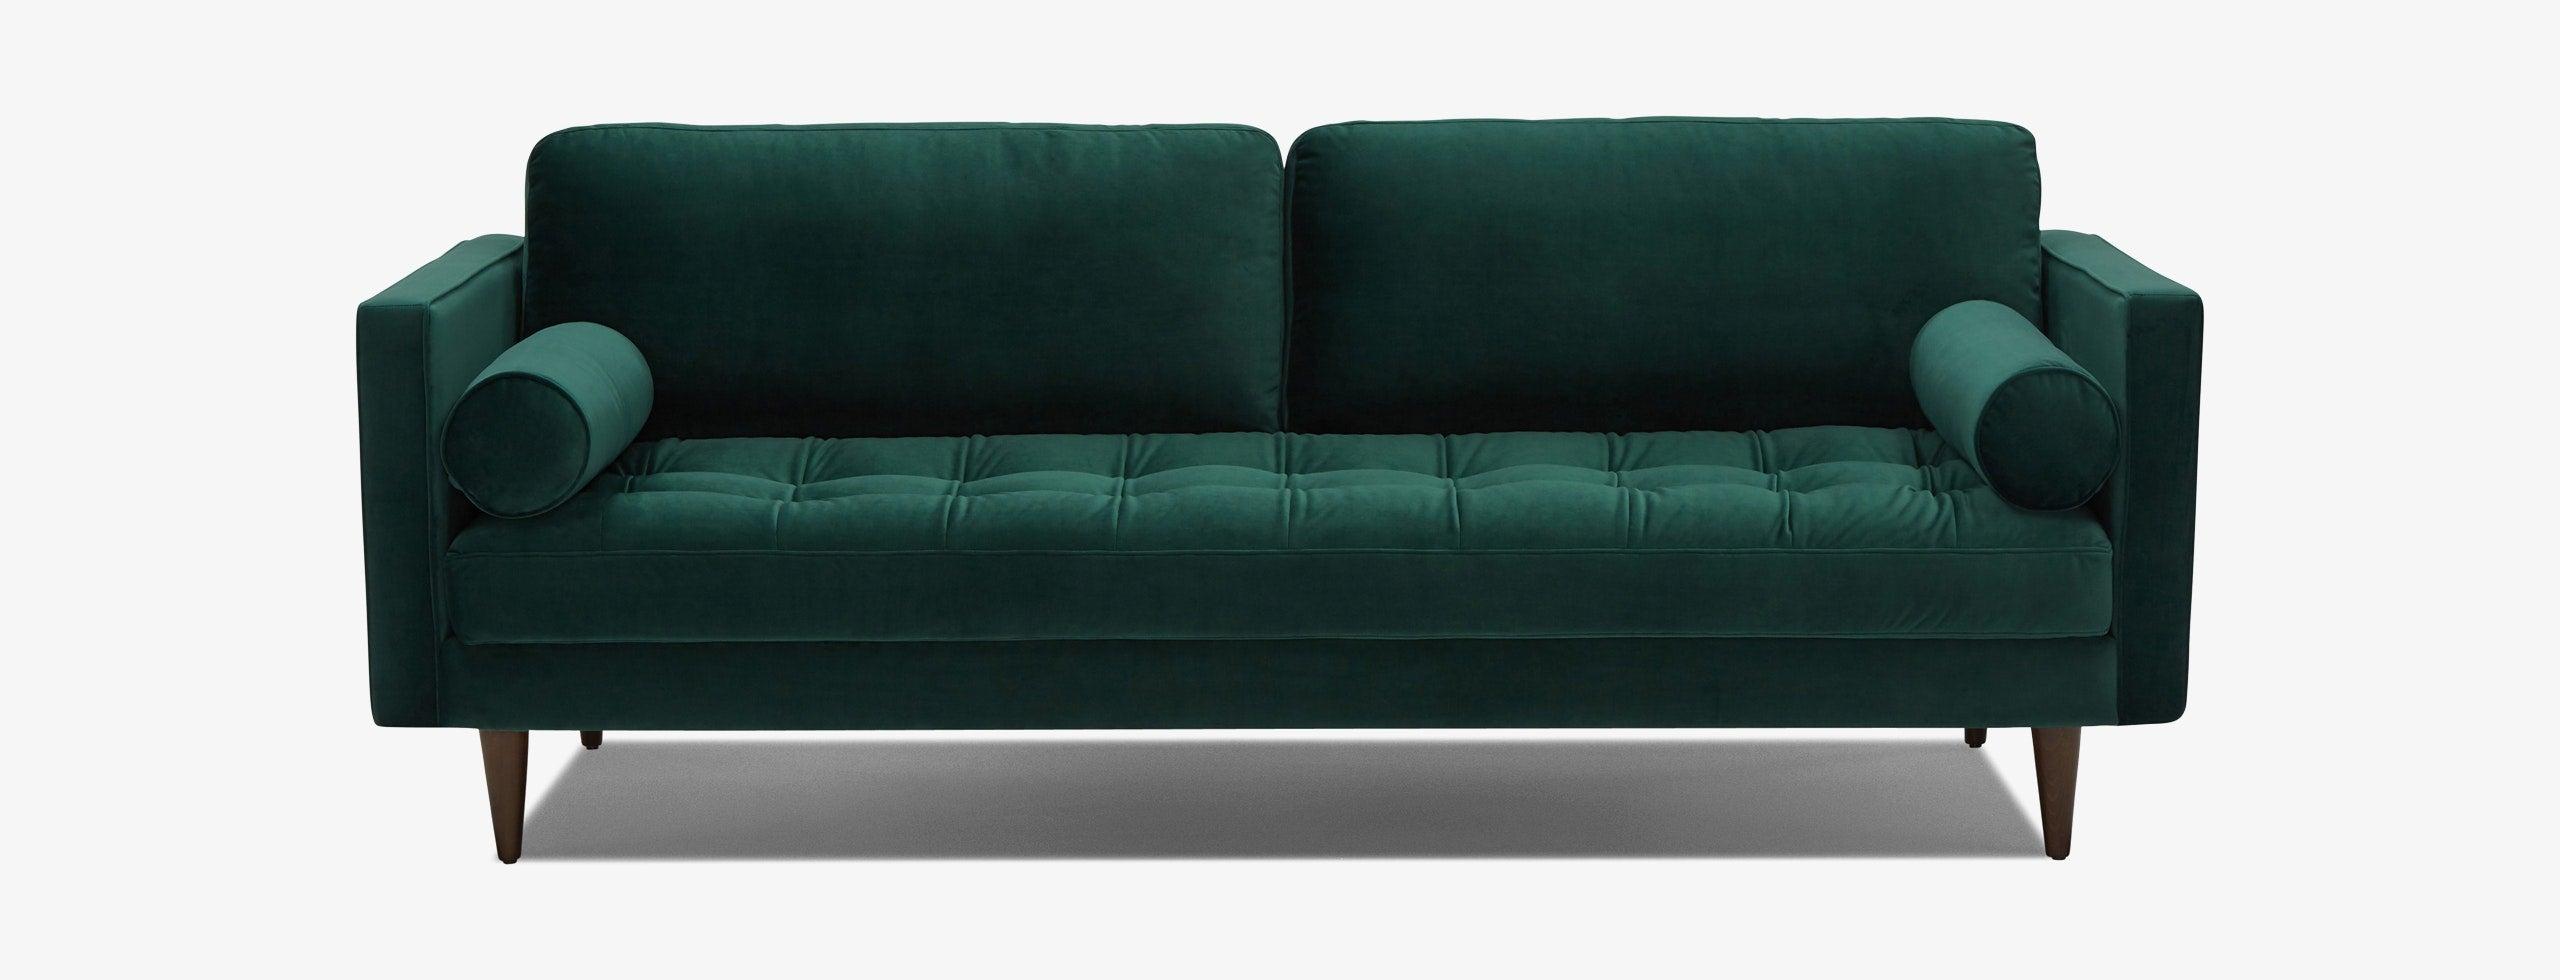 Briar-Sofa-Royale-Evergreen-T1-439